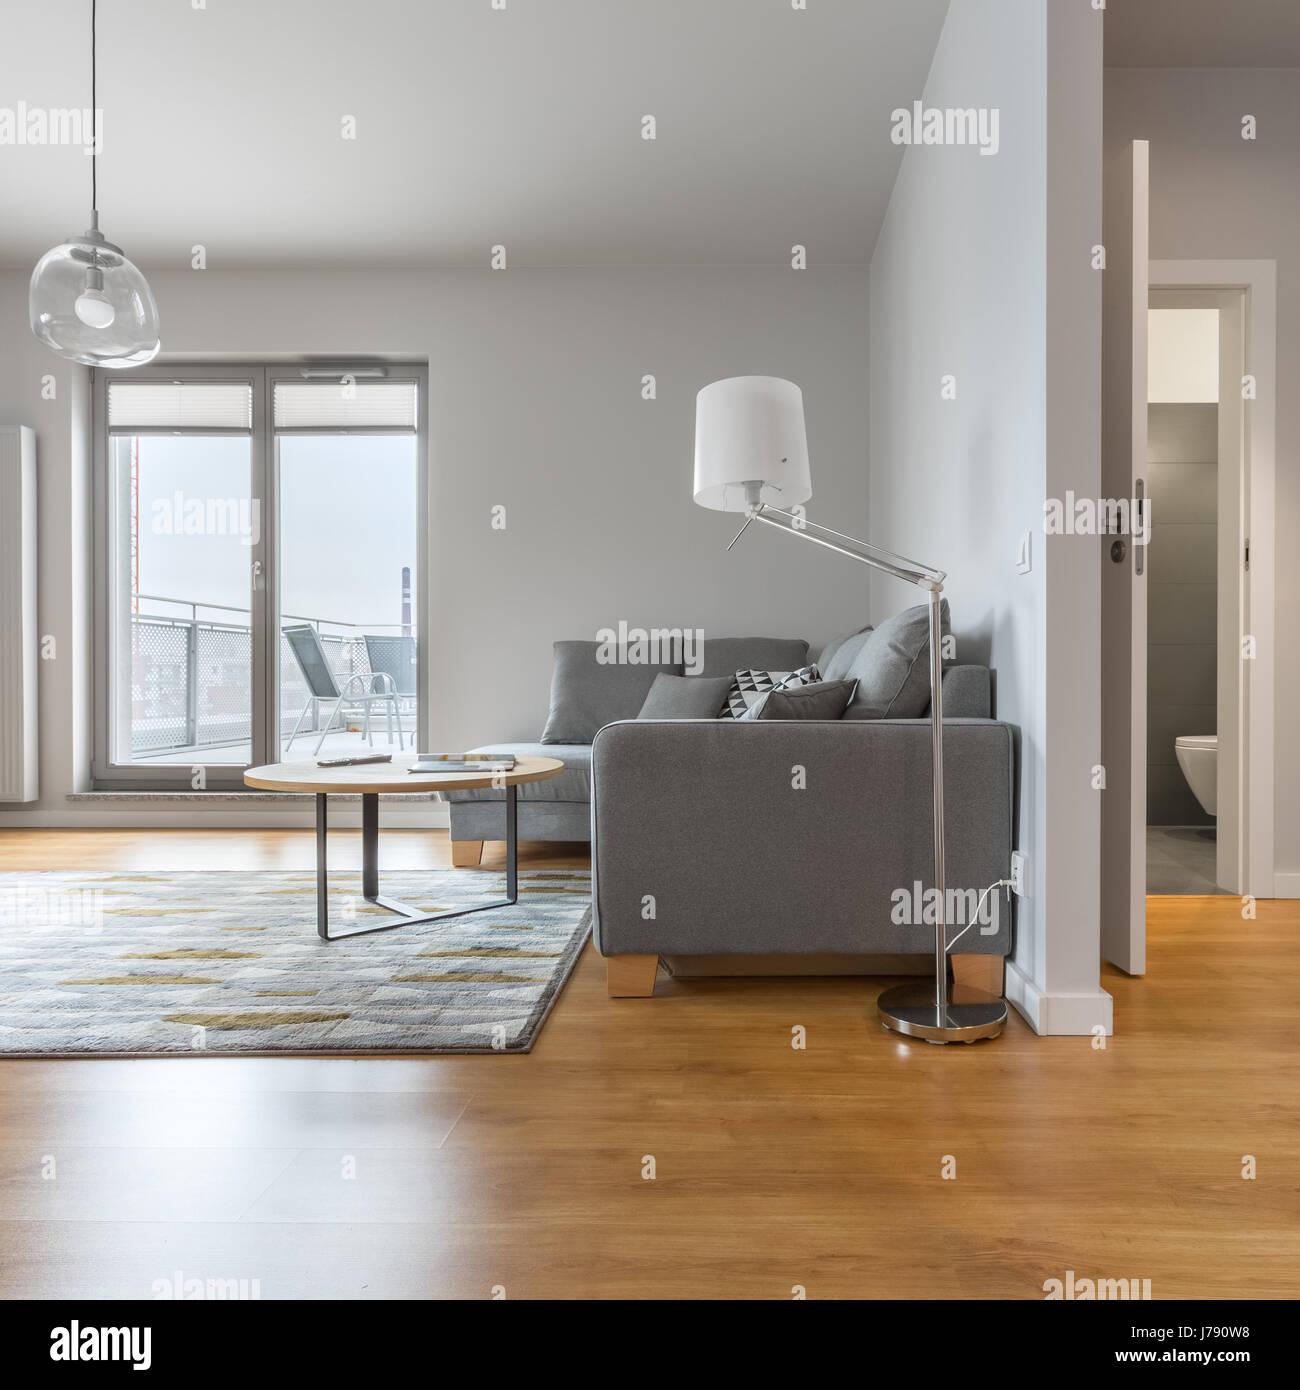 Modern living room with big window, next to hallway and bathroom doors open - Stock Image